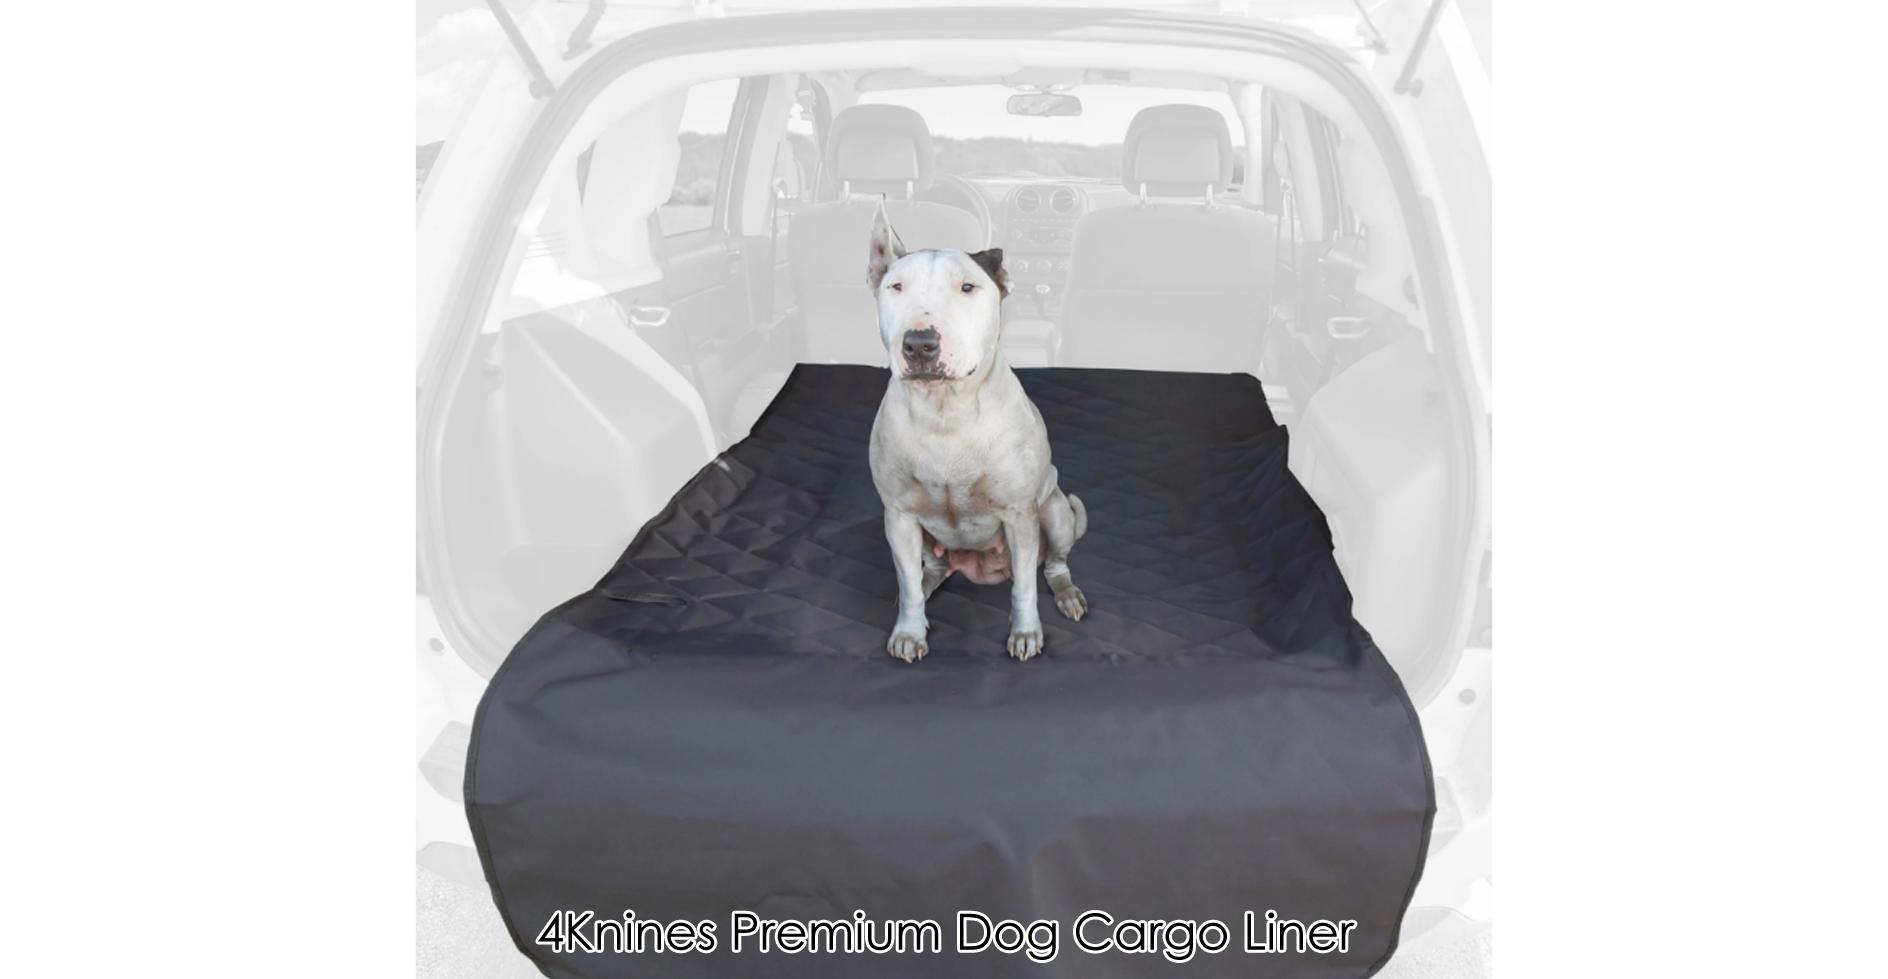 4Knines Premium Dog Cargo Liner